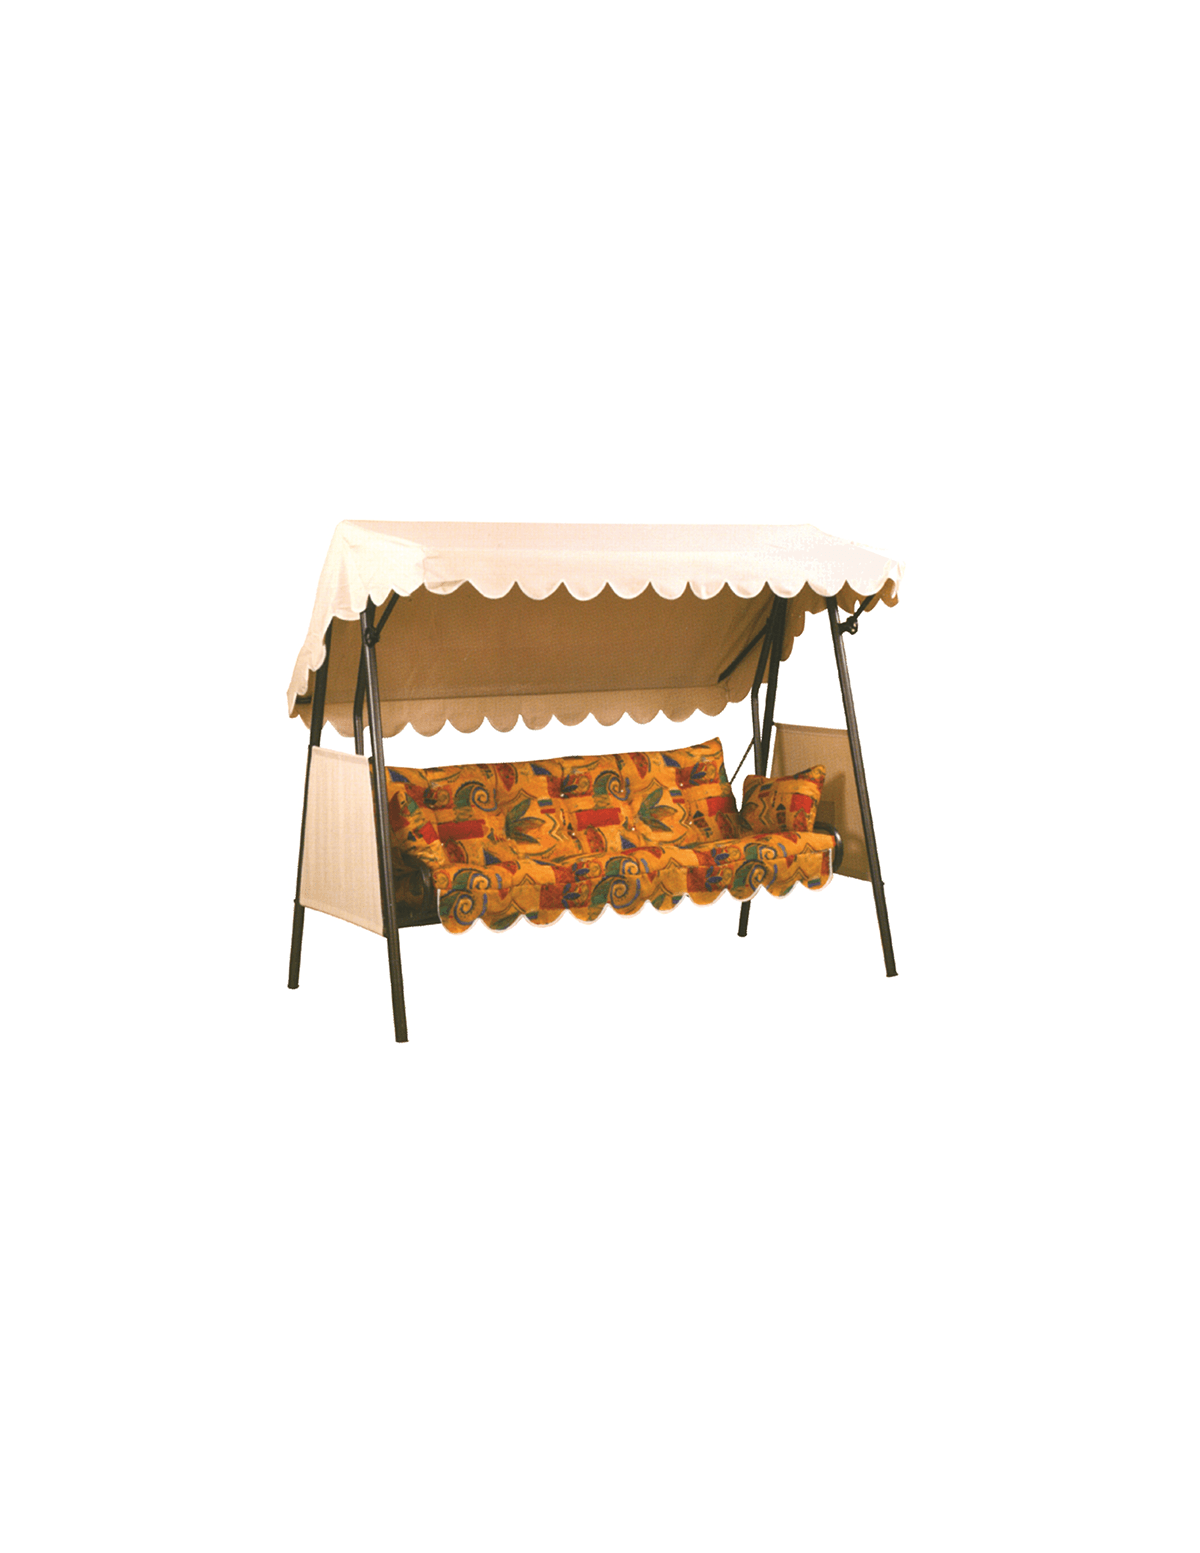 d4b17fc6033 SG15207. κούνια κρεβάτι BELLA – GardenHome